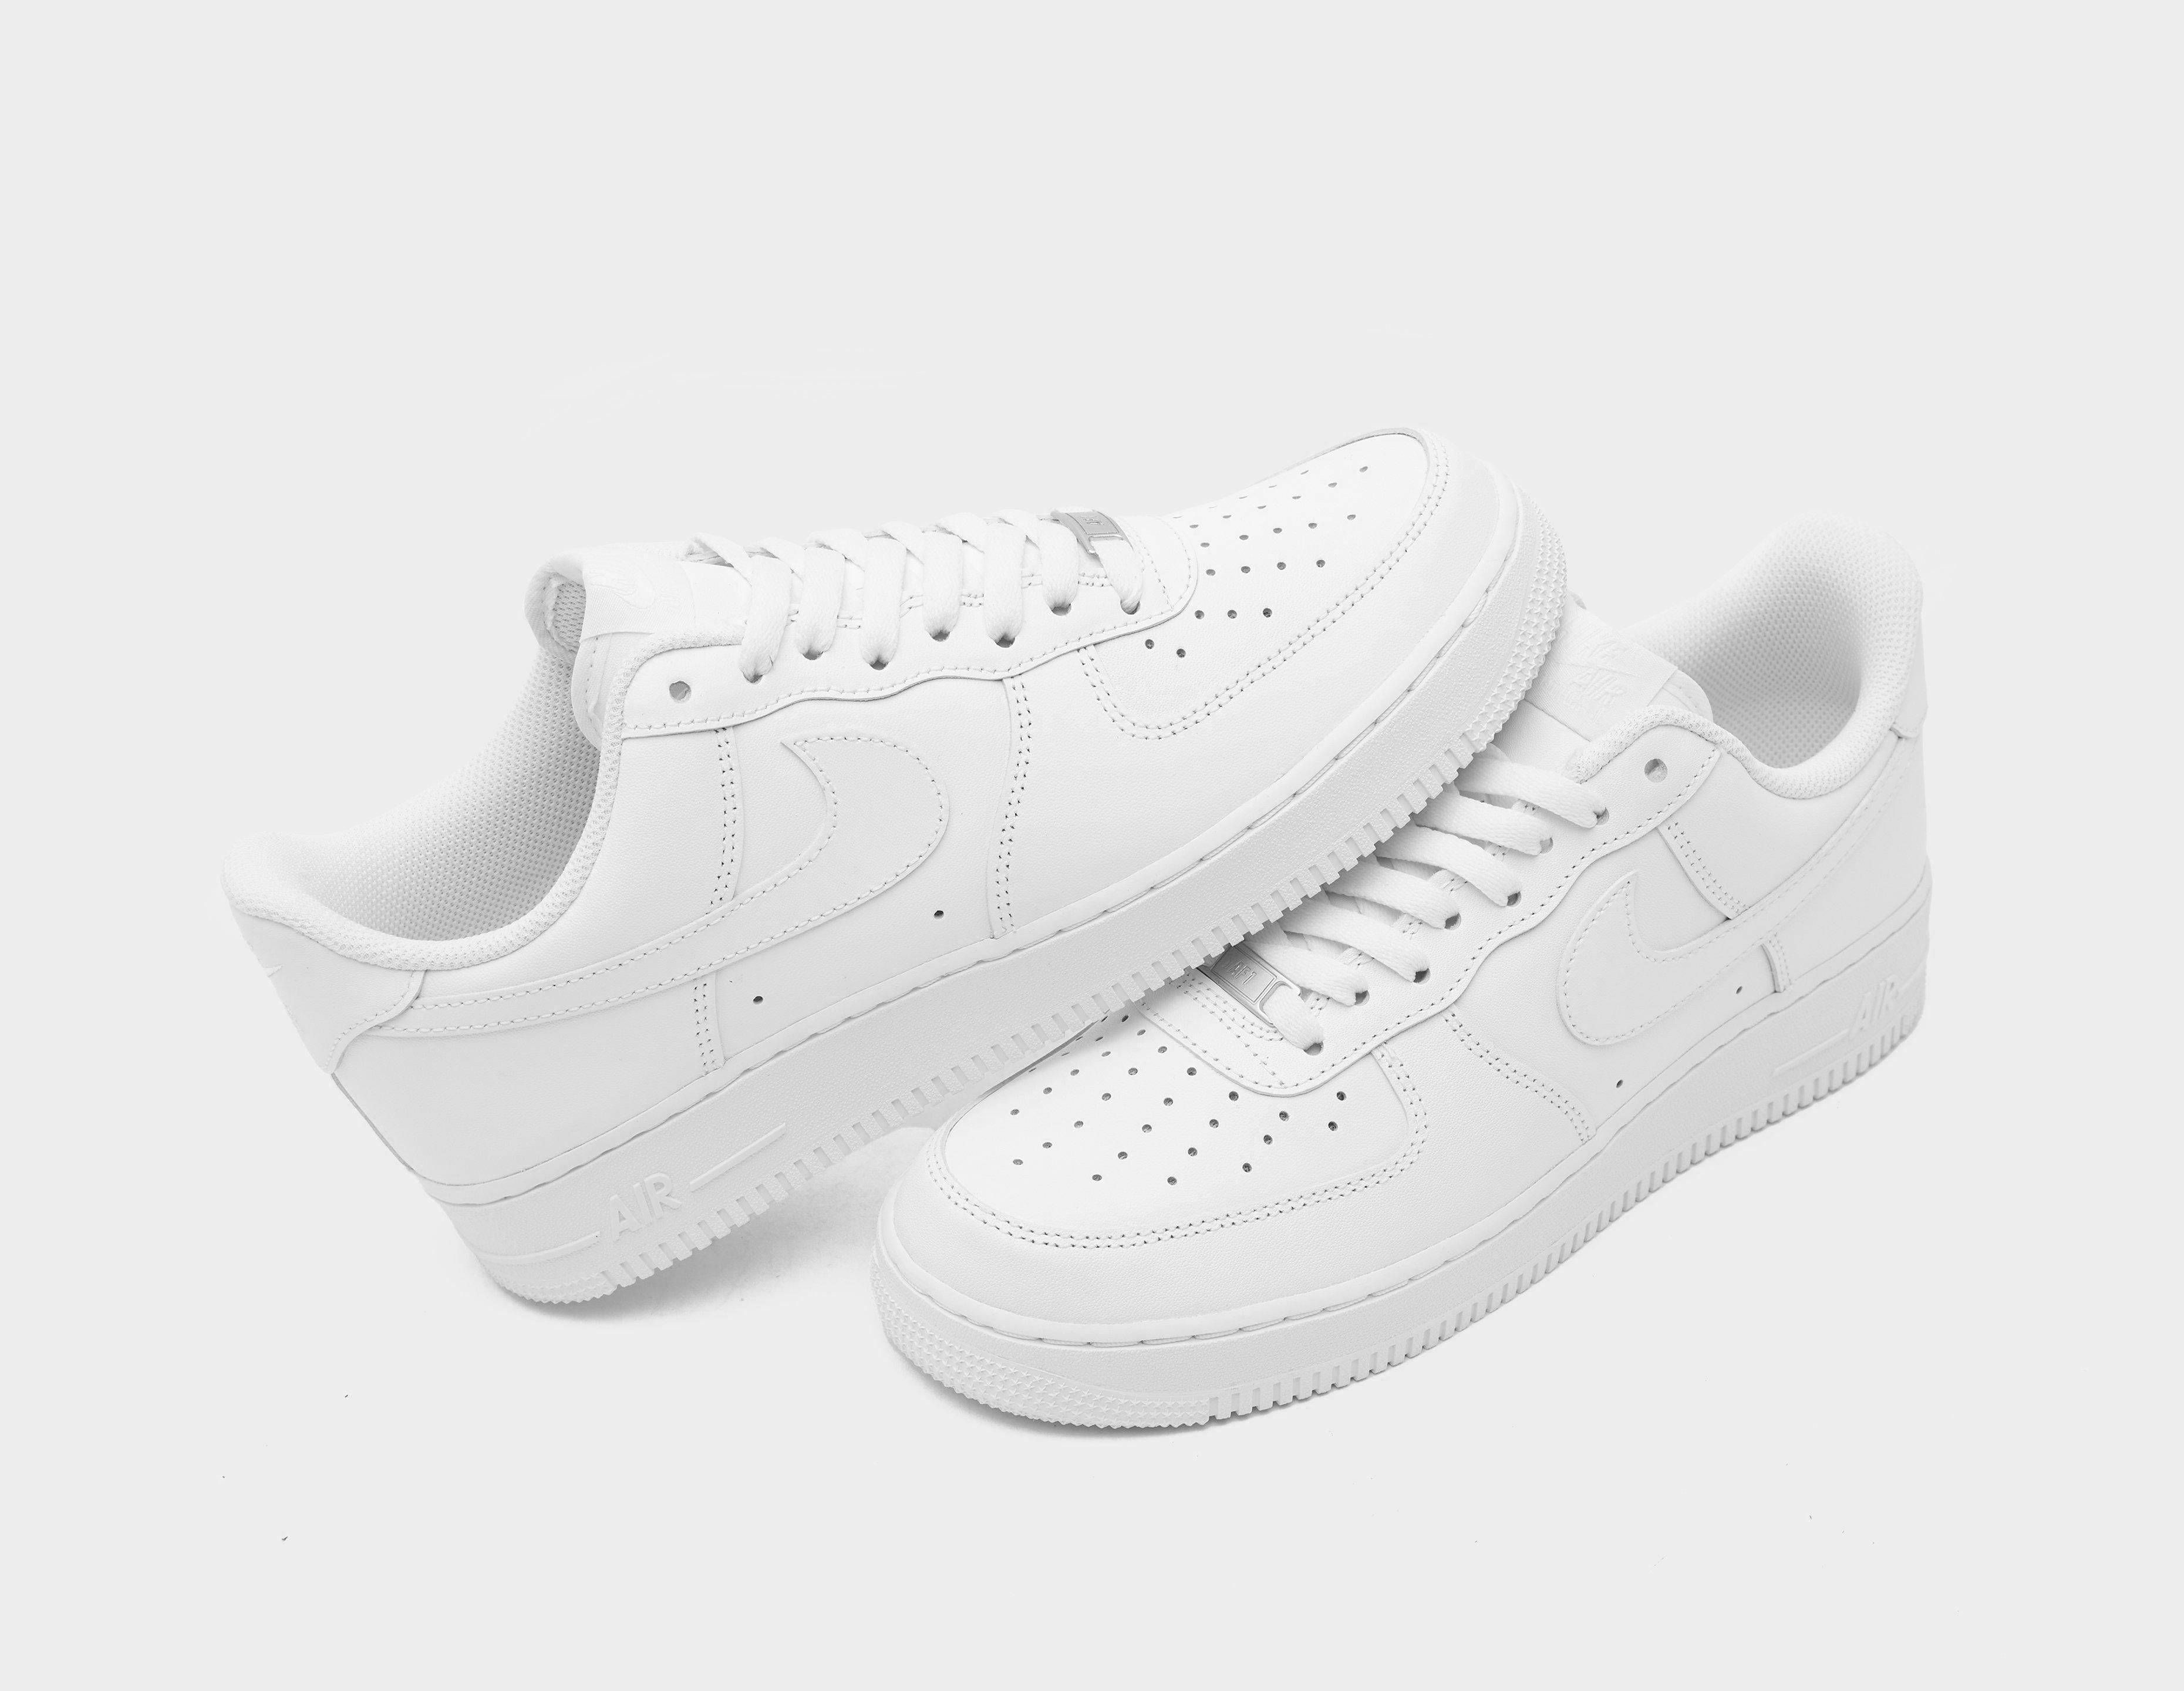 Nike Air Force White Nike Huarache Premium Aluminum Black And White ...